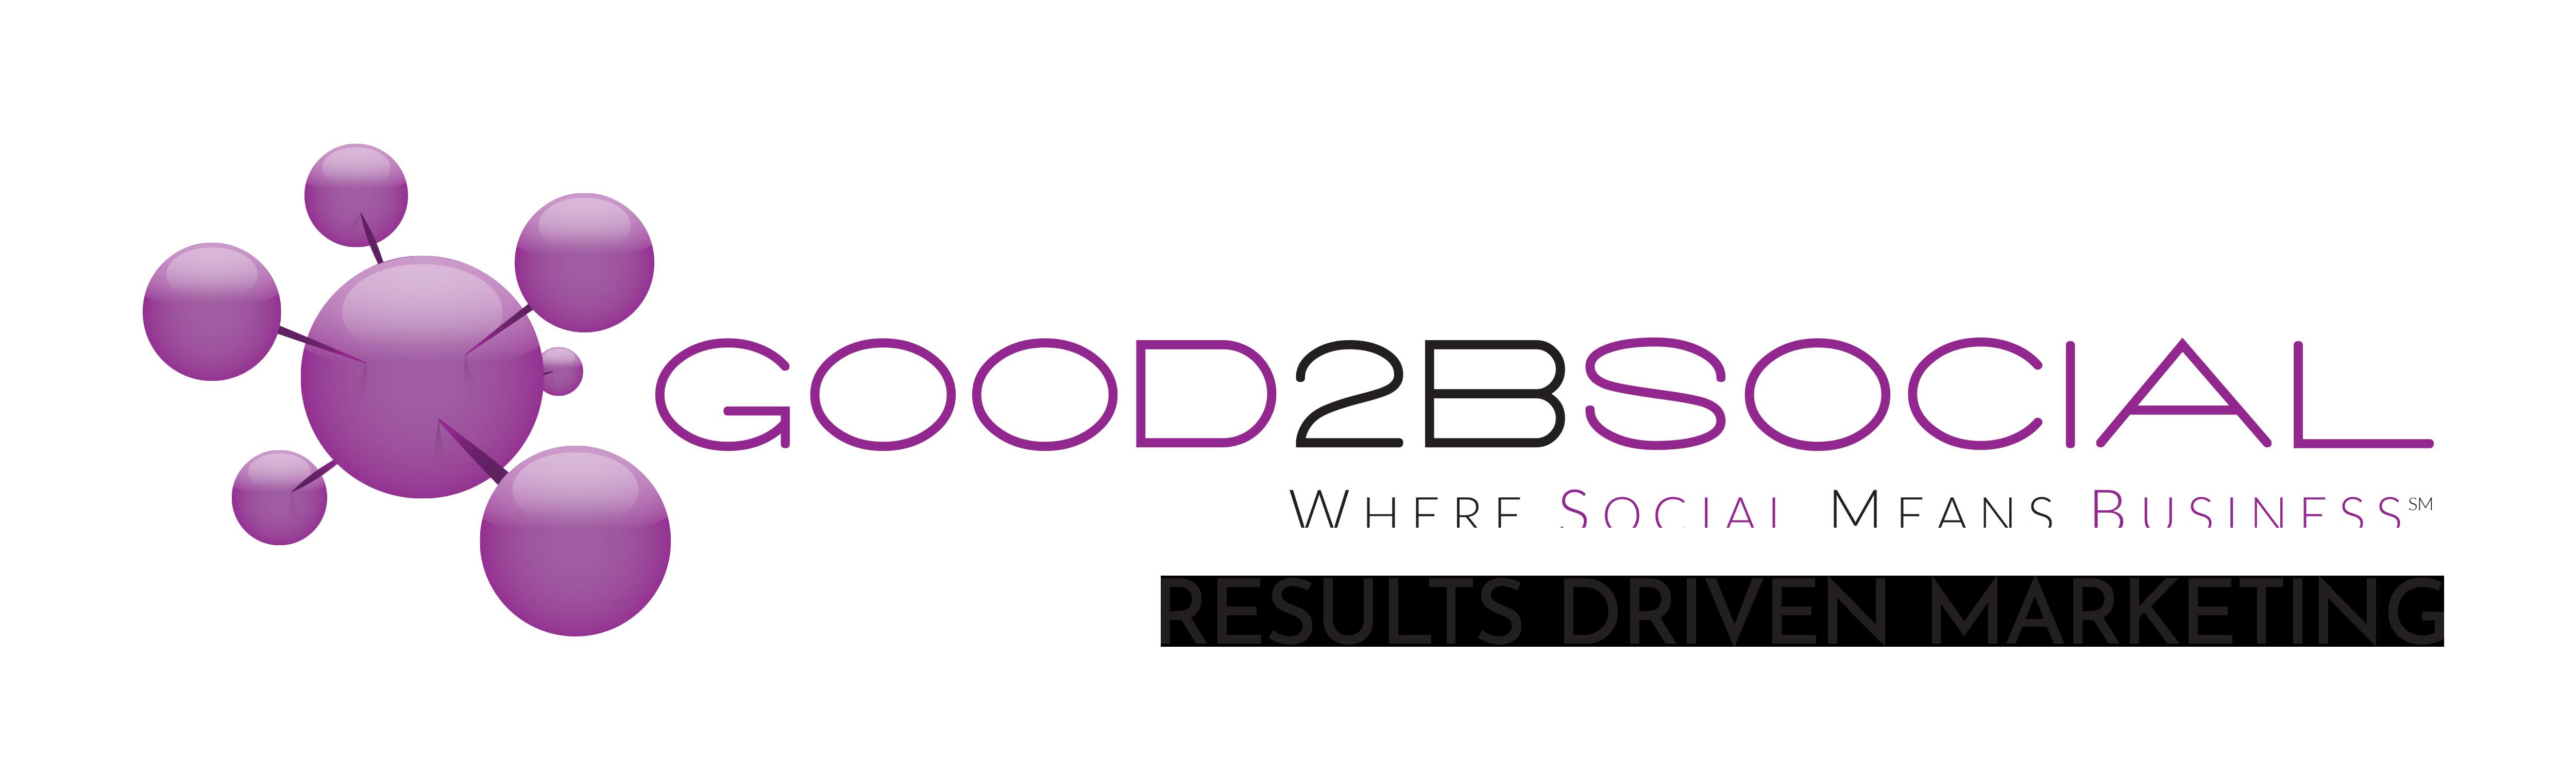 Good2bSocial Announces the 2019 Social Law Firm Index